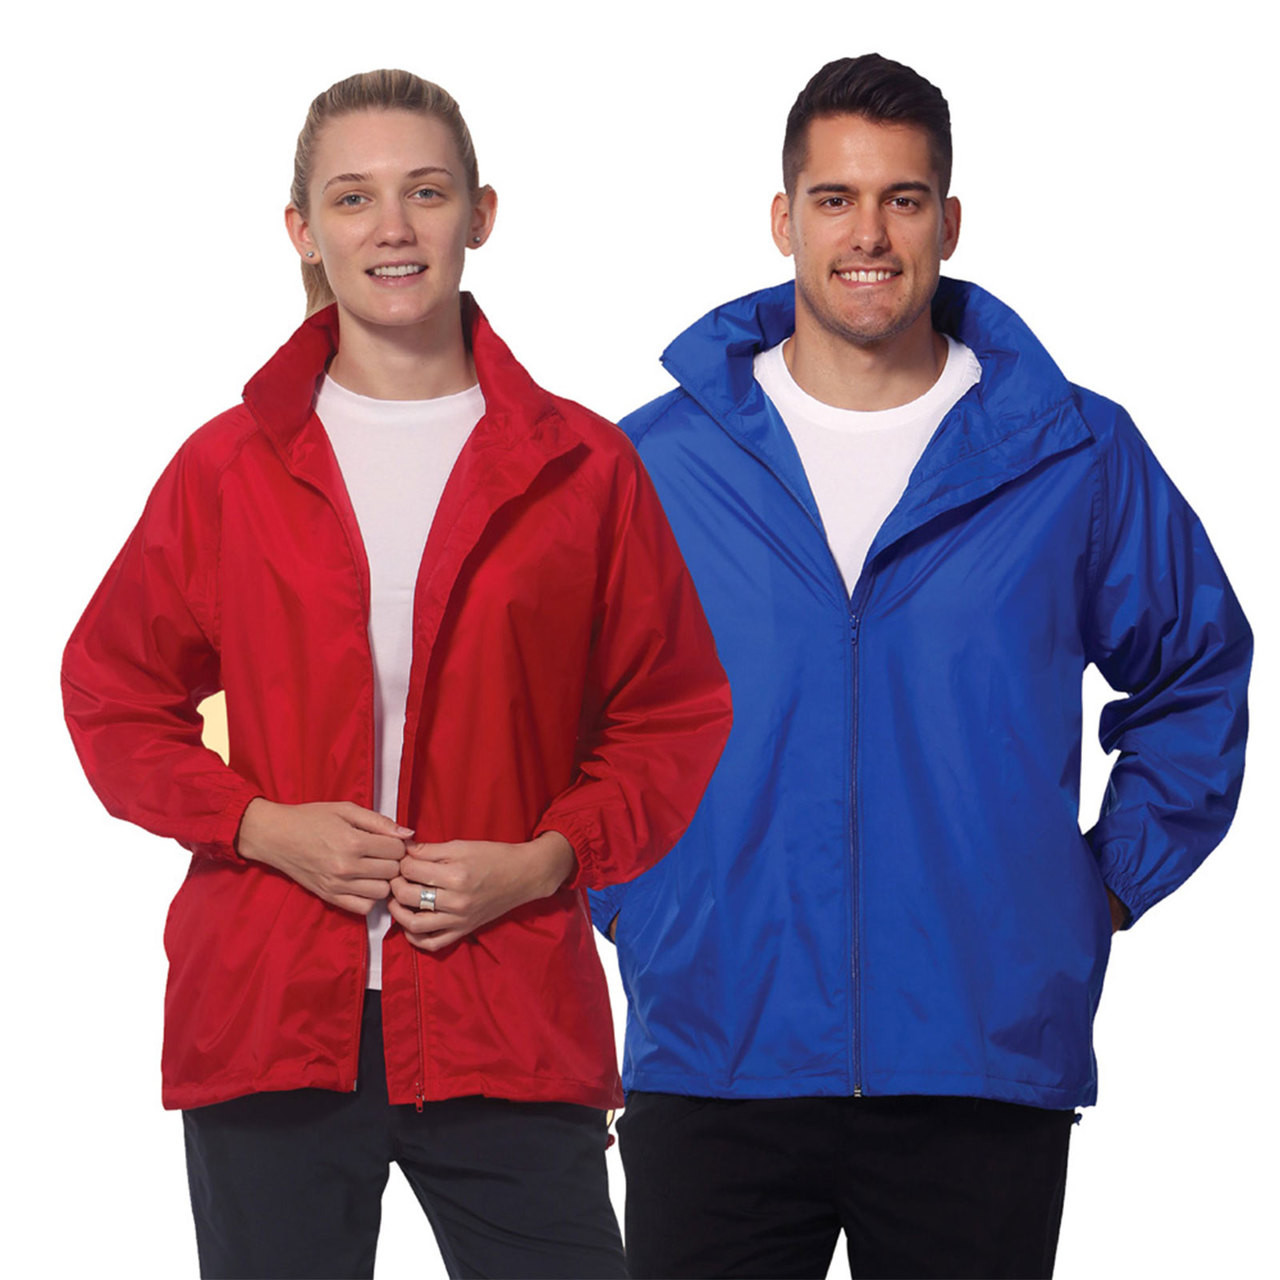 fb457f2ea travel foldaway rain jackets with hood   wholesale plain weather jacket    Plus Size Jackets